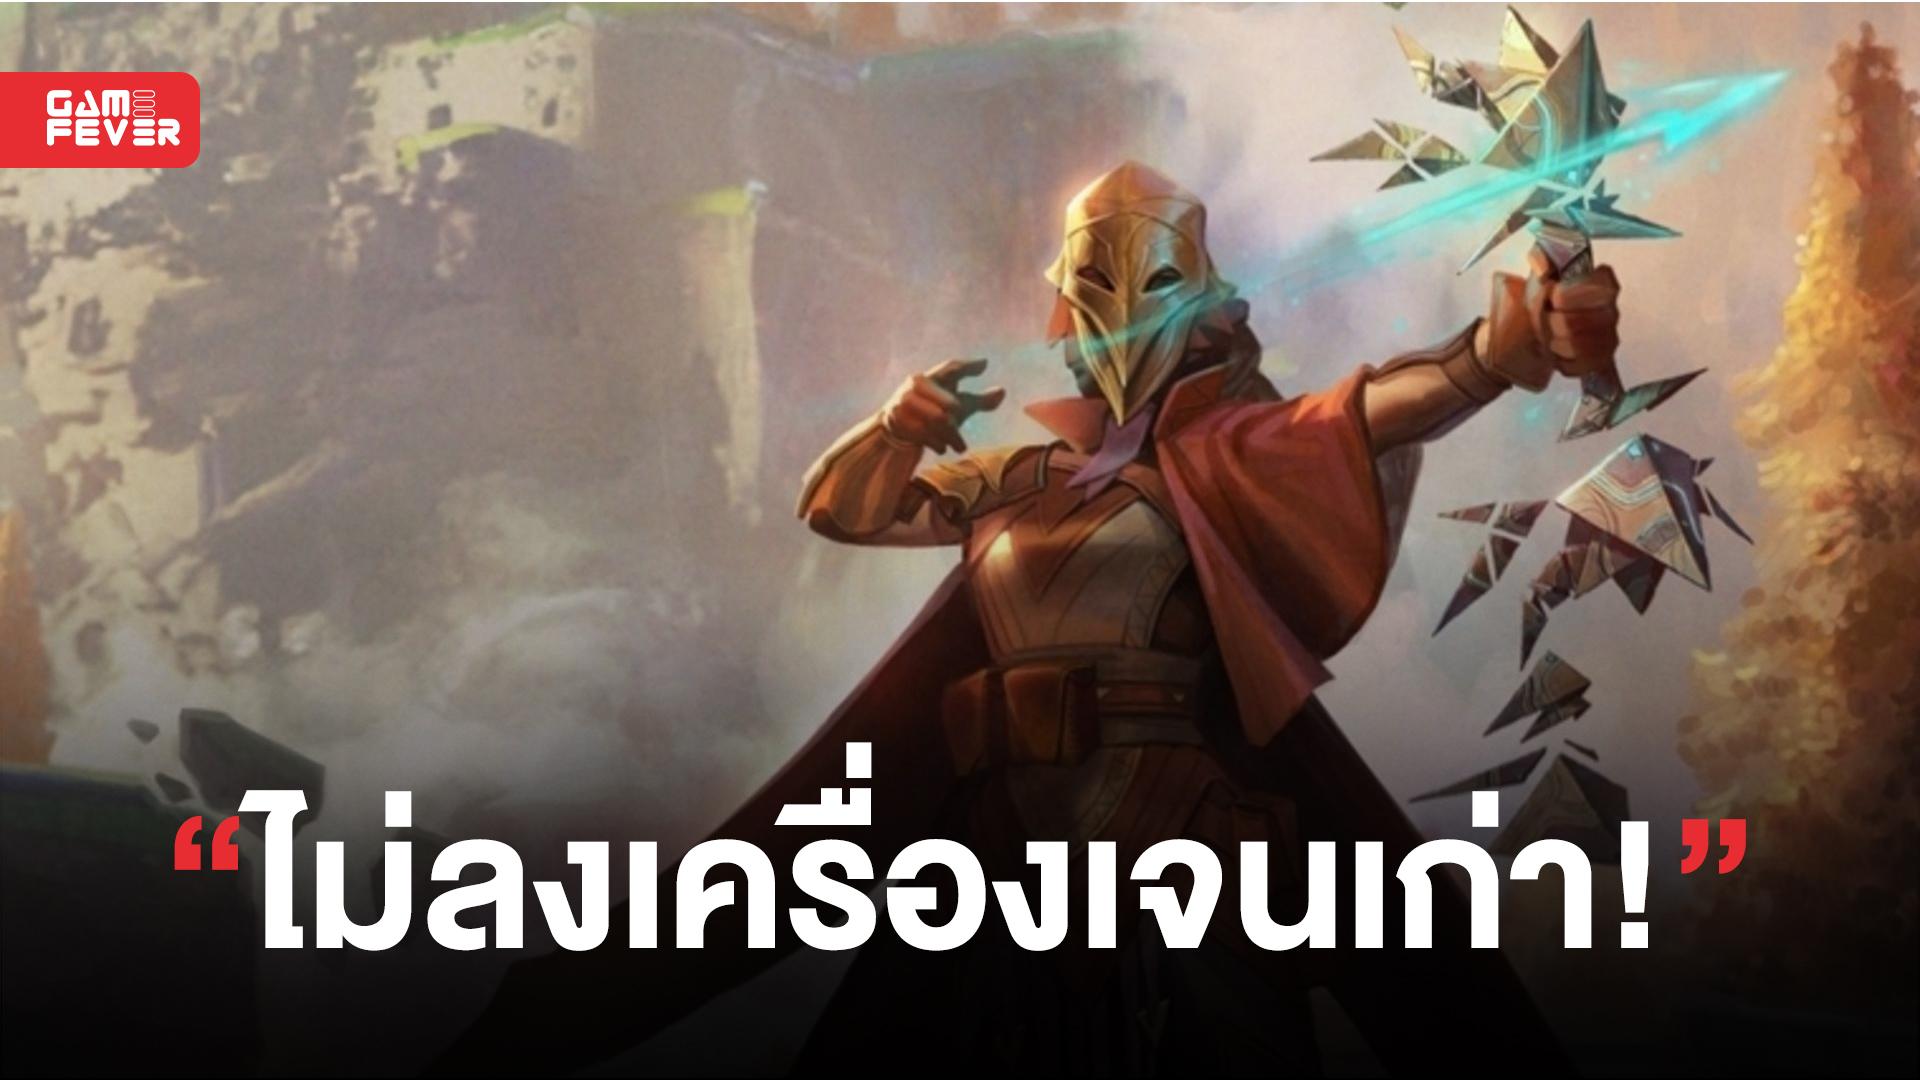 Dragon Age 4 จะลงให้กับ Console เจนใหม่ กับ PC เท่านั้นไม่ลง PS4 กับ Xbox One